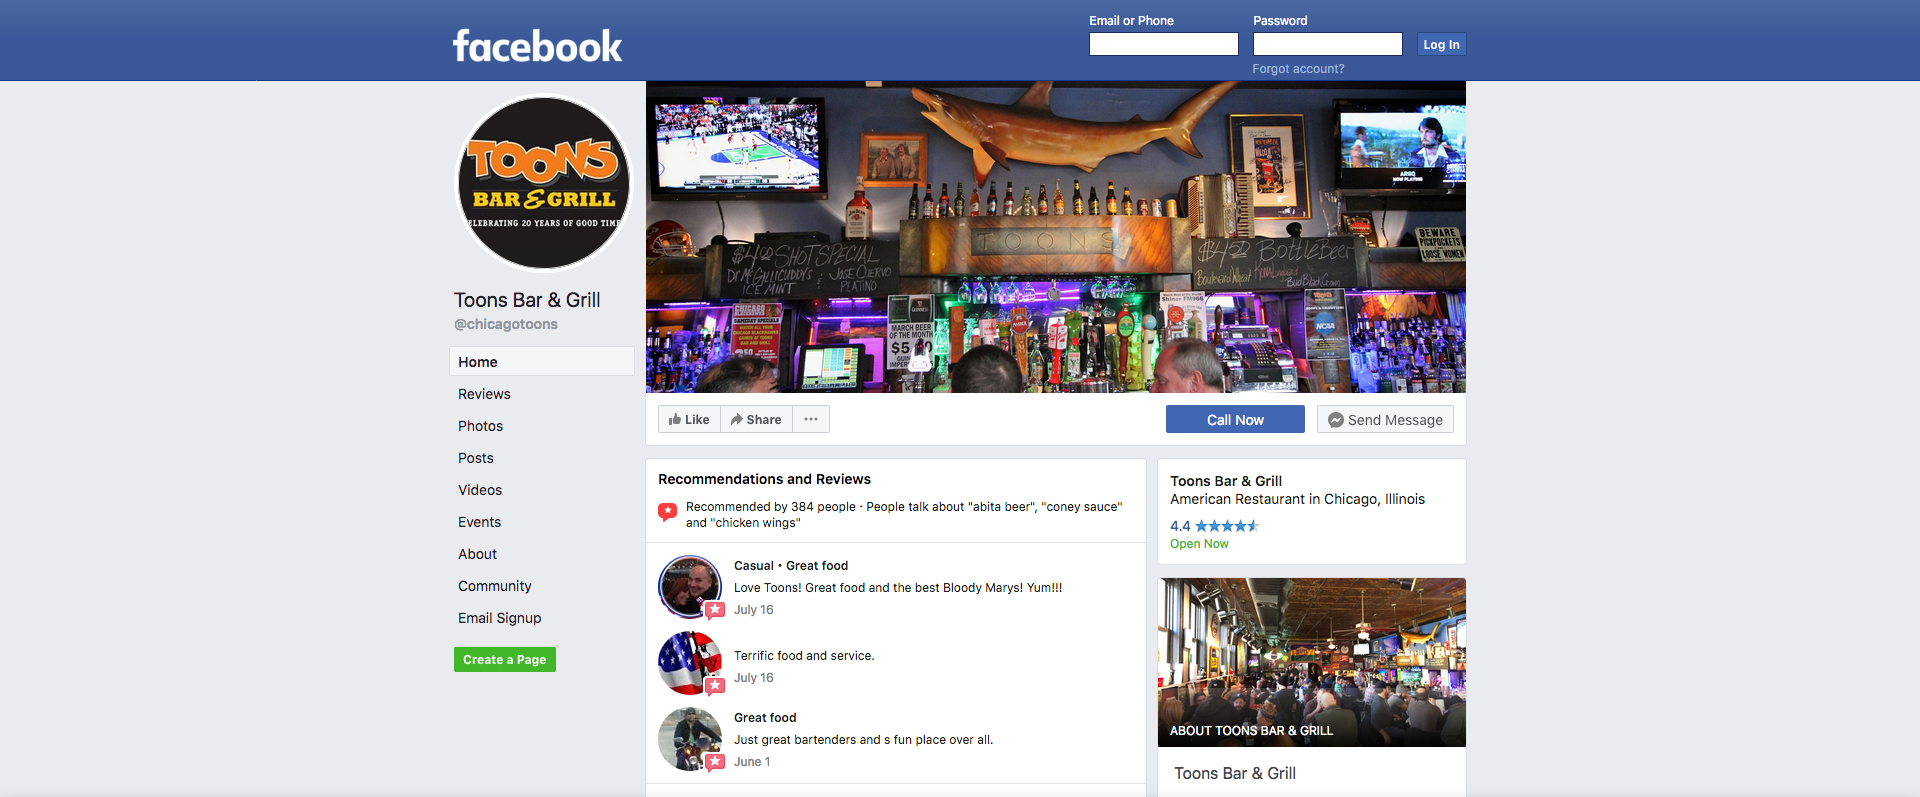 Toons Bar & Grill - Facebook